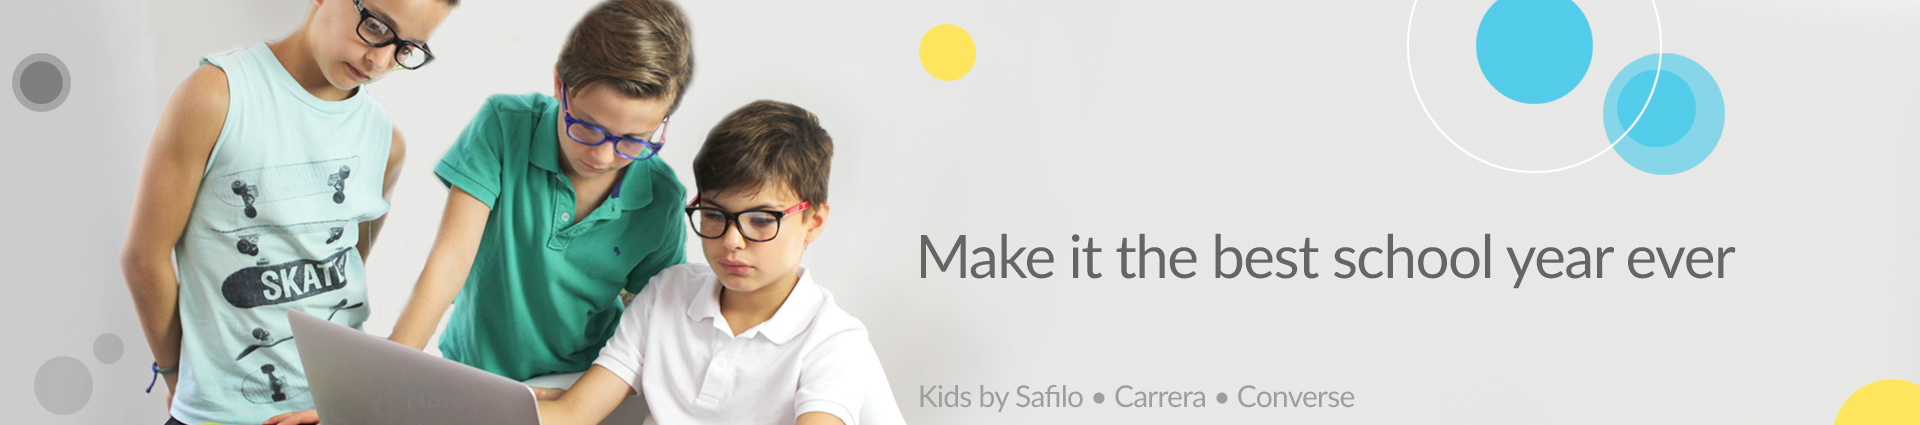 Kids By Salifo - Carrera - Converse